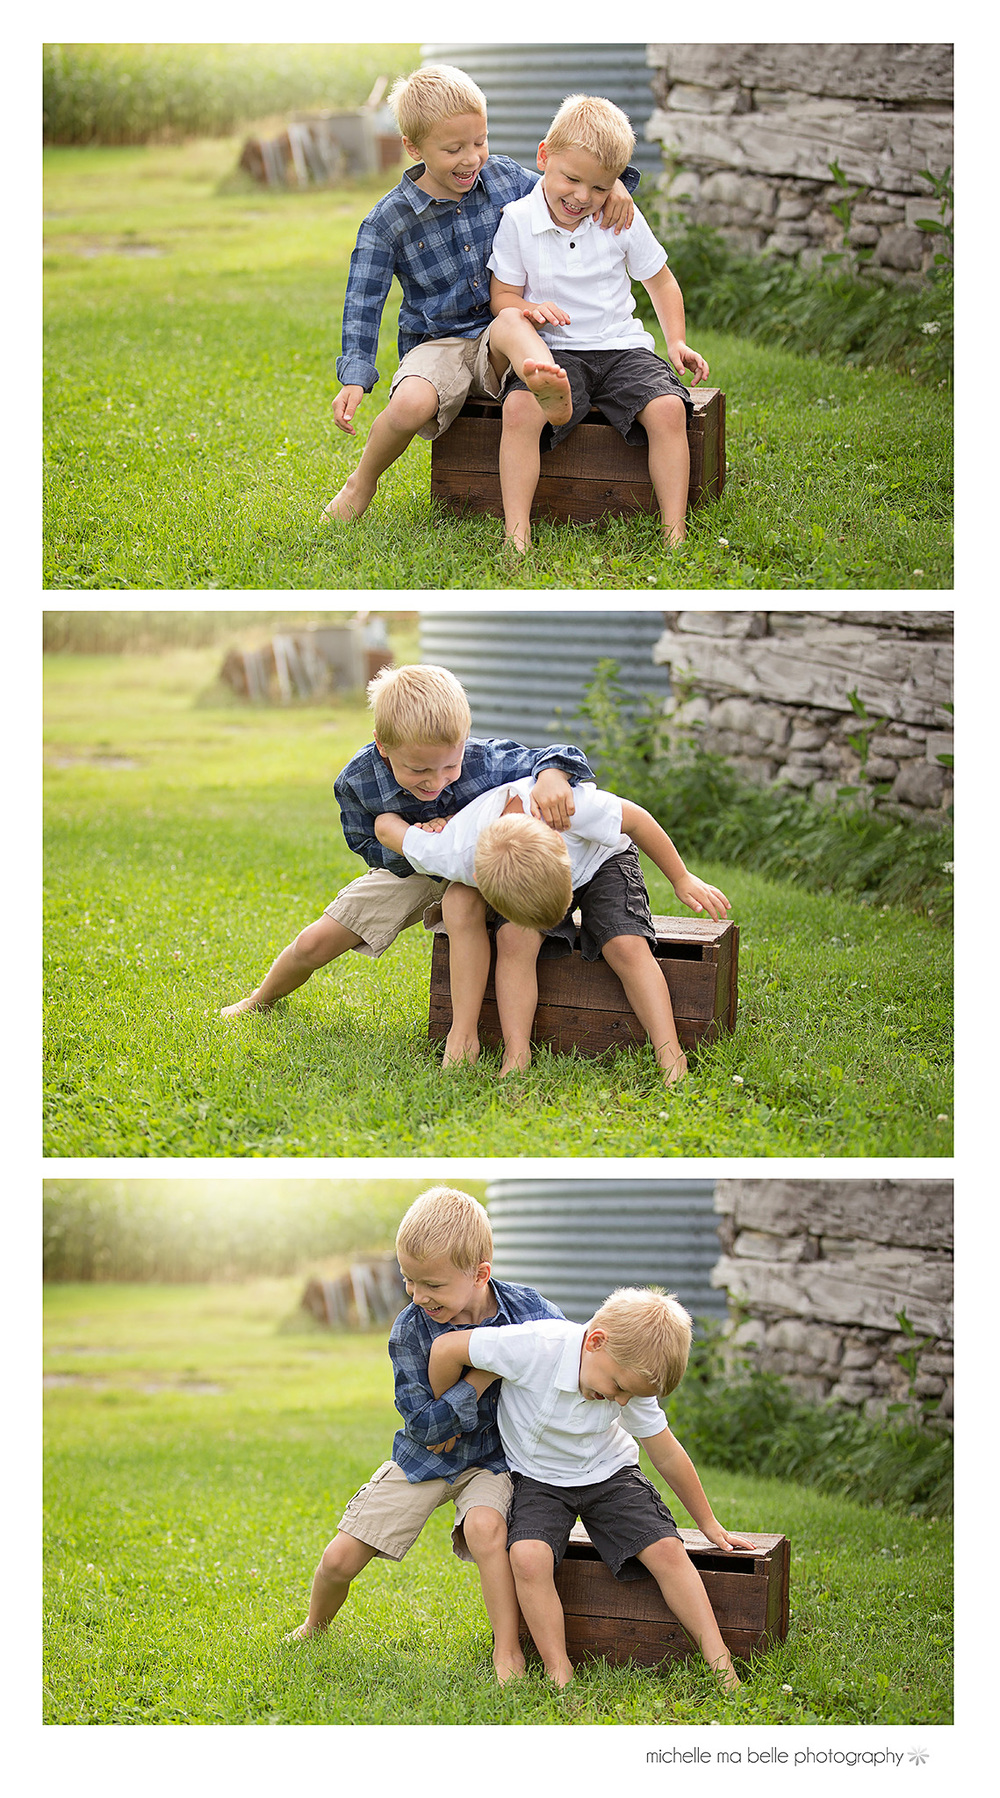 brotherscollage.jpg